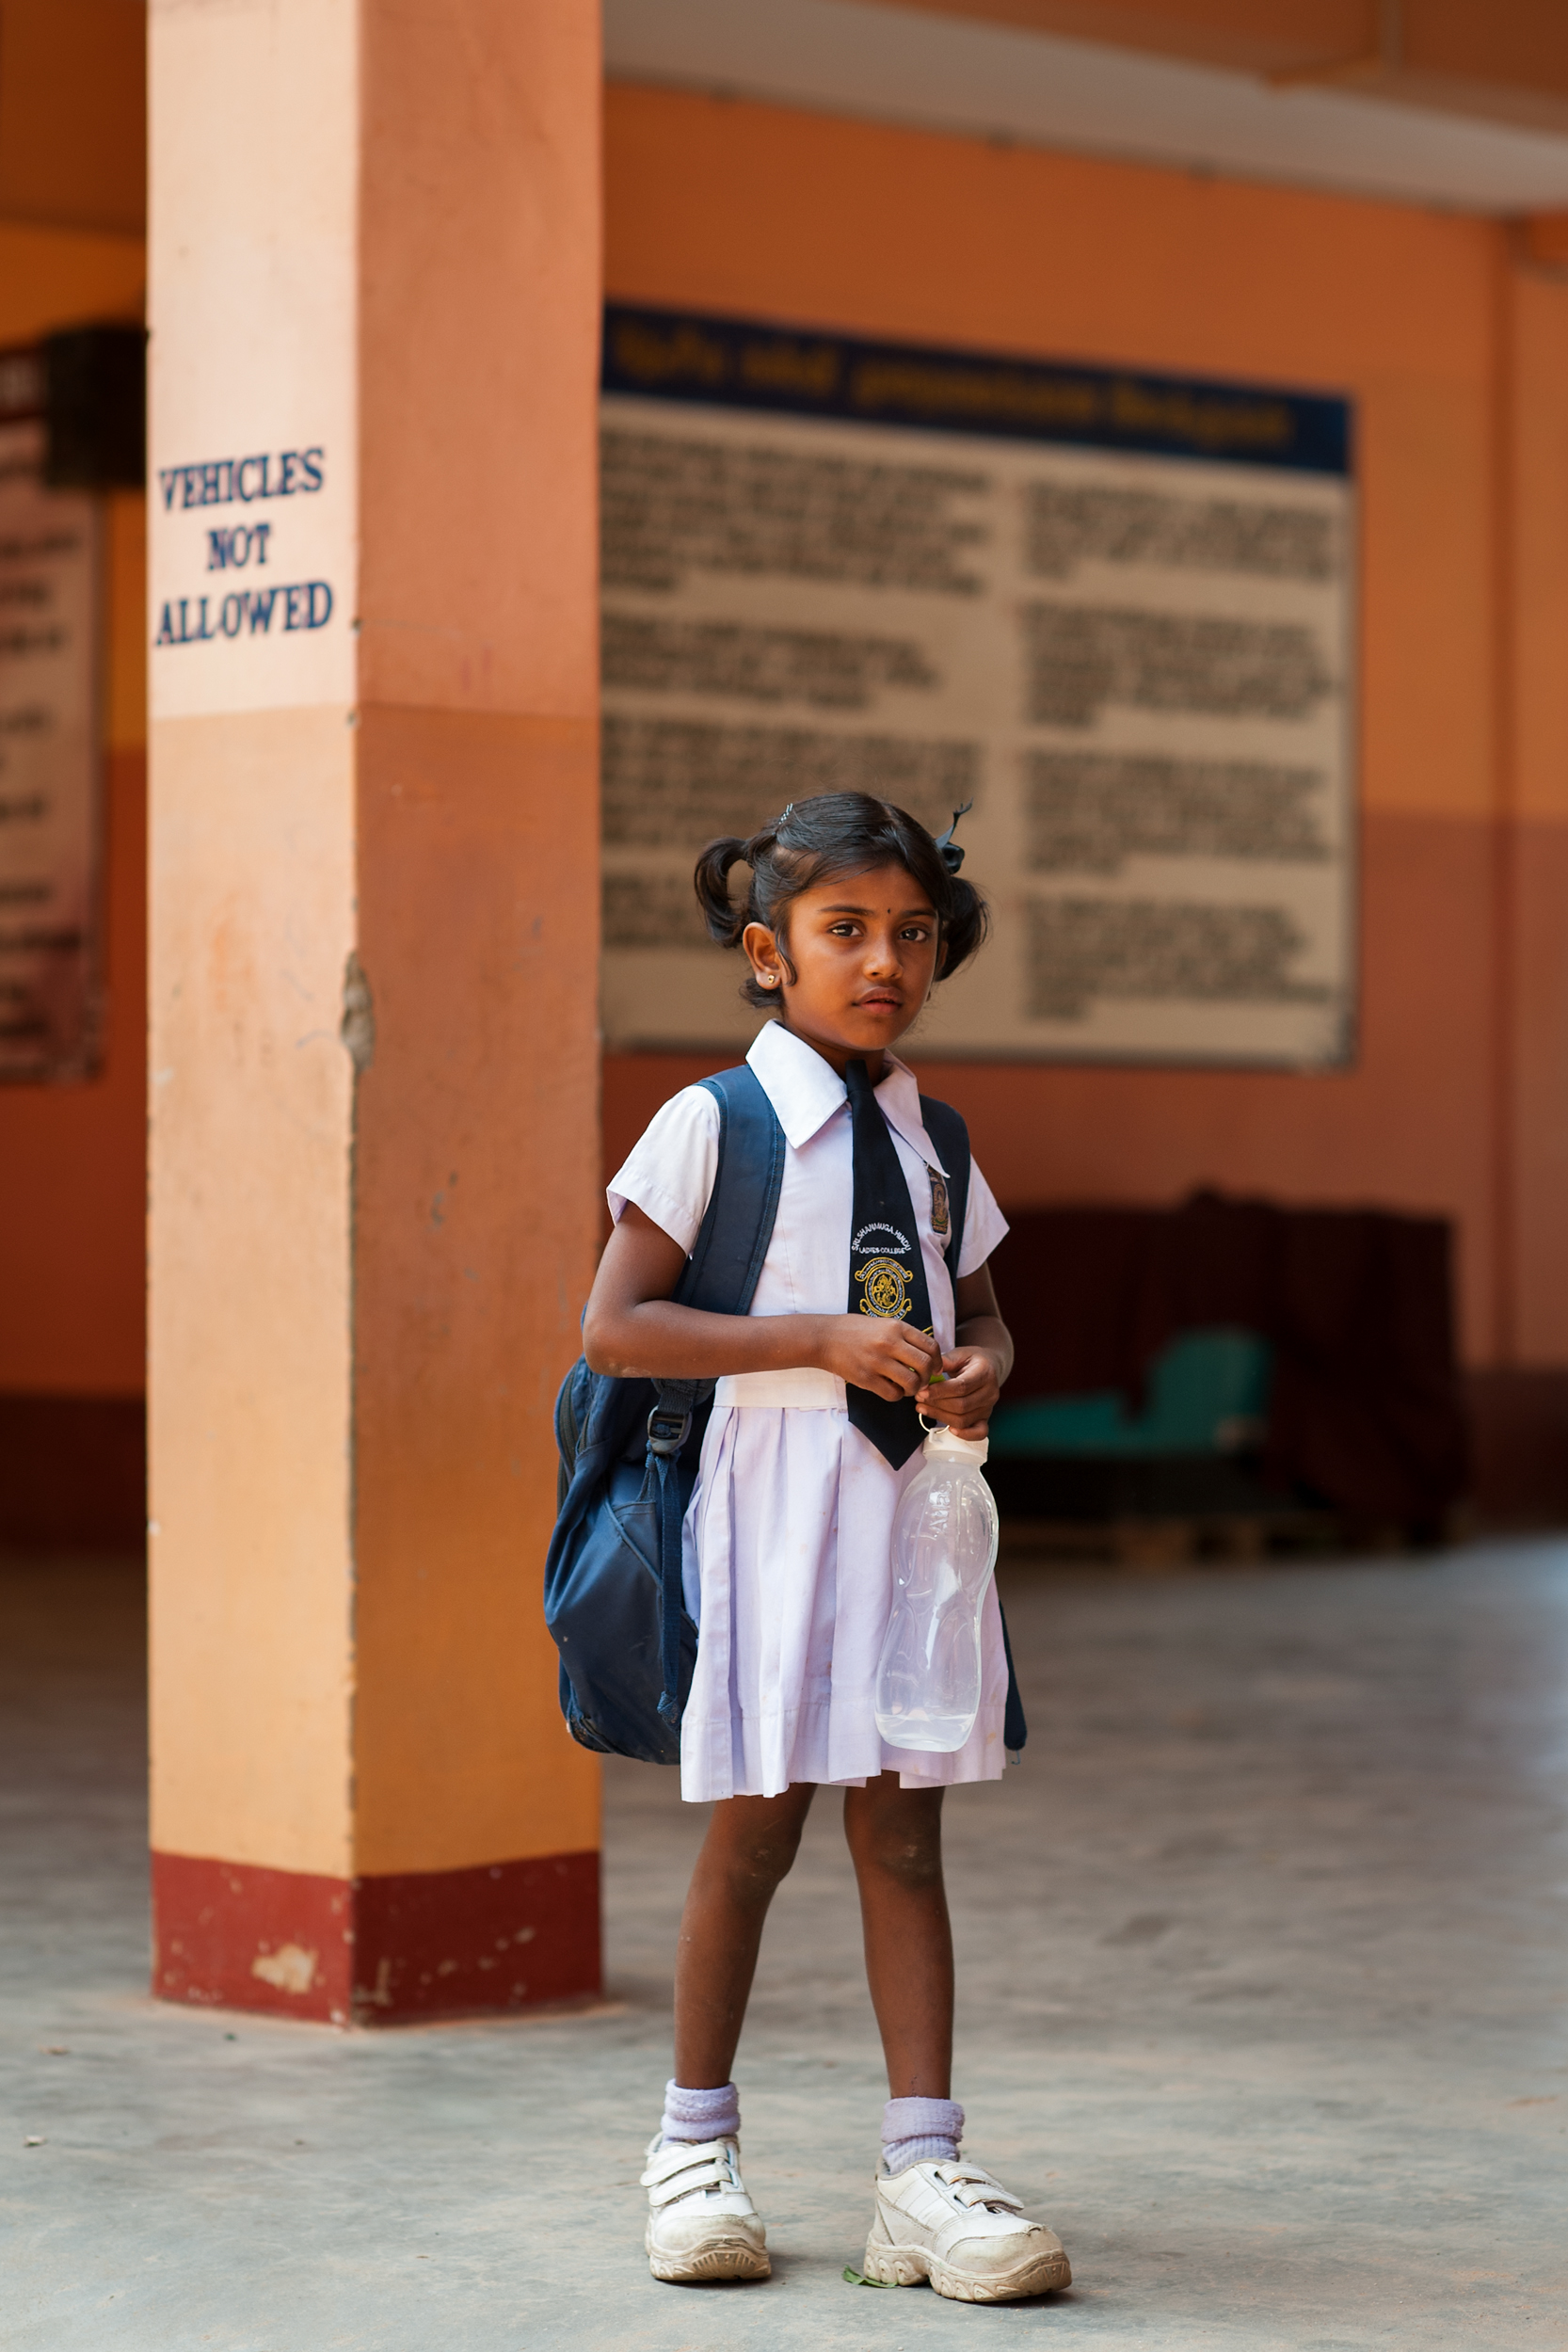 Schoolgirl, Trincomalee